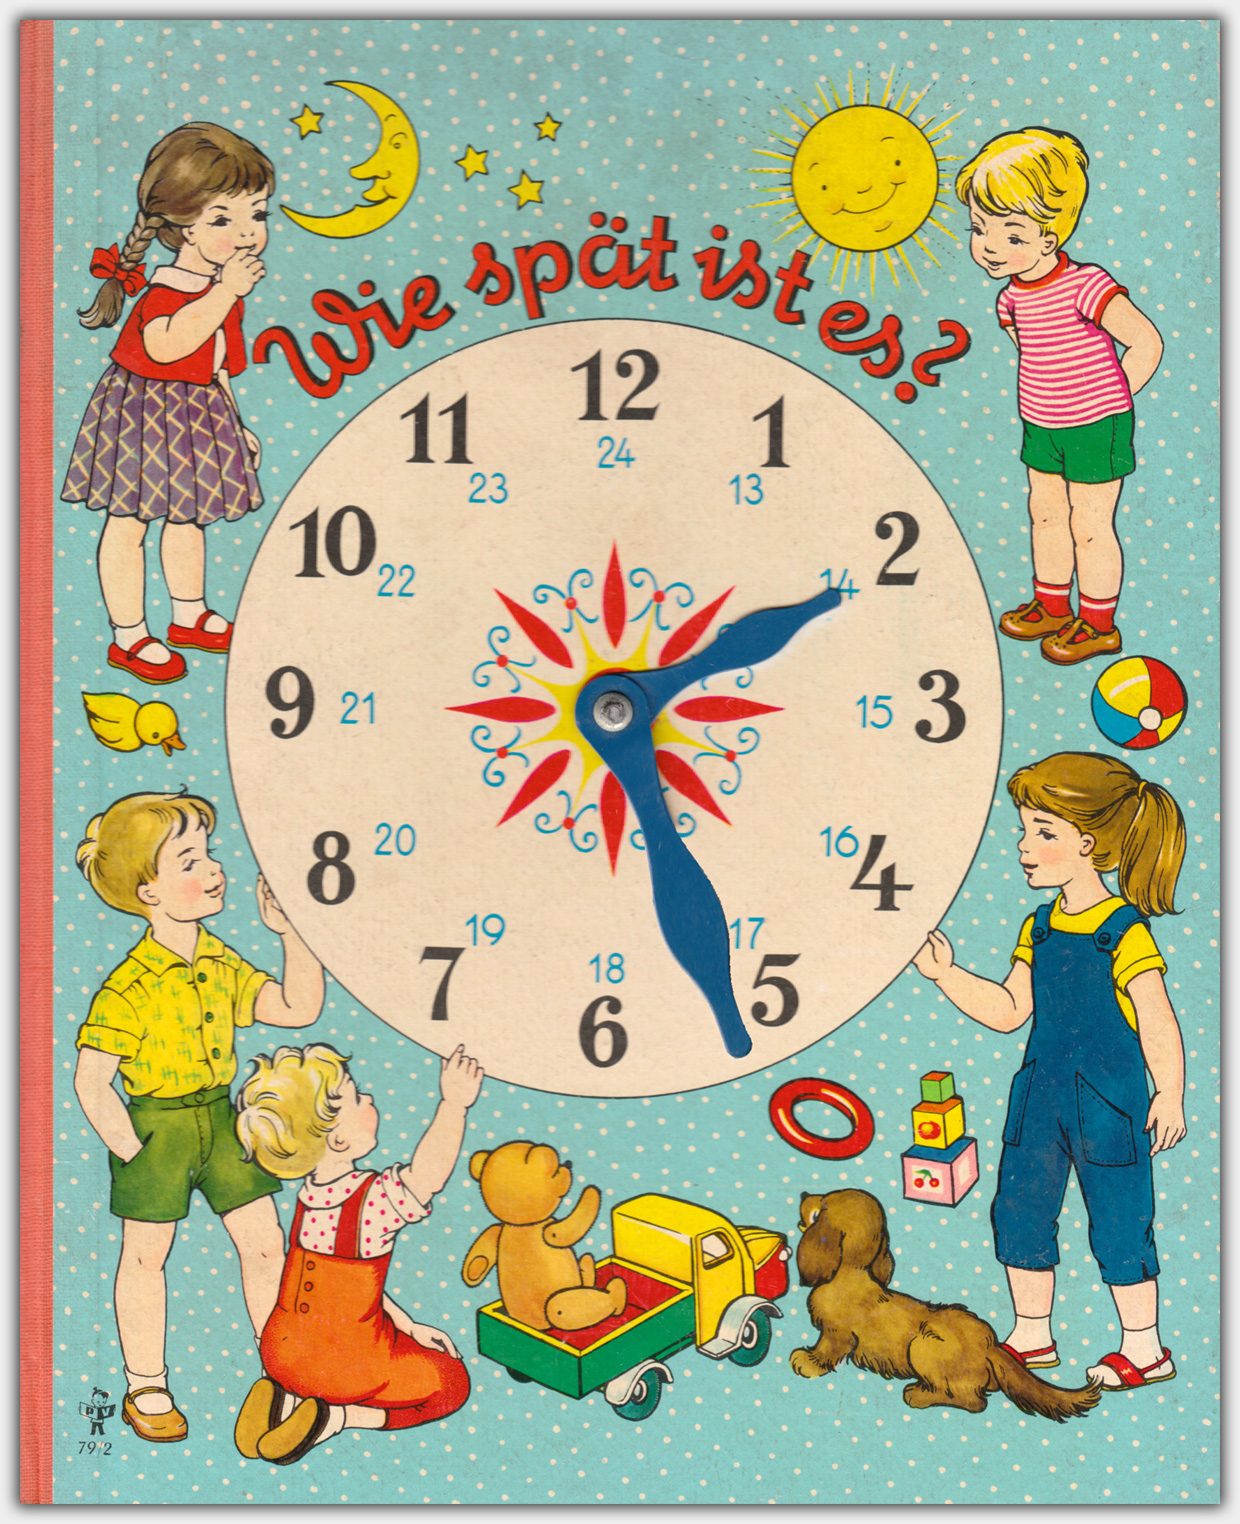 Wie spät ist es? | Pestalozzi Verlag | Verlagsnummer 79/2